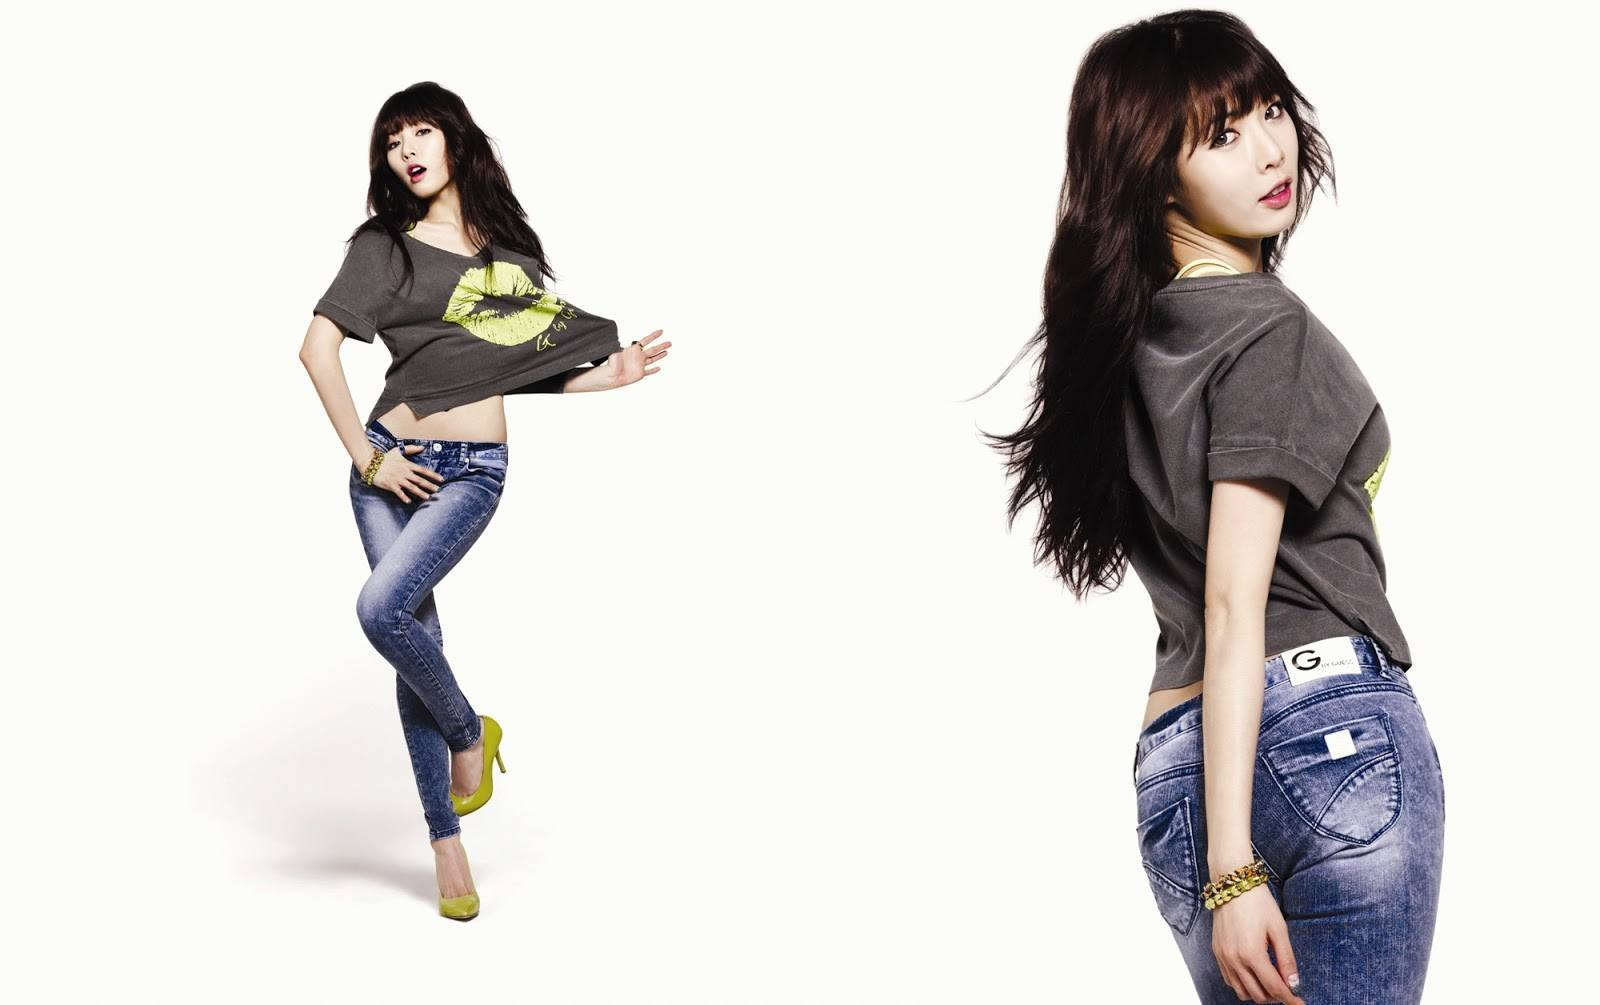 Top 10 Sexiest HQ HyunA Photos - Koreaboo